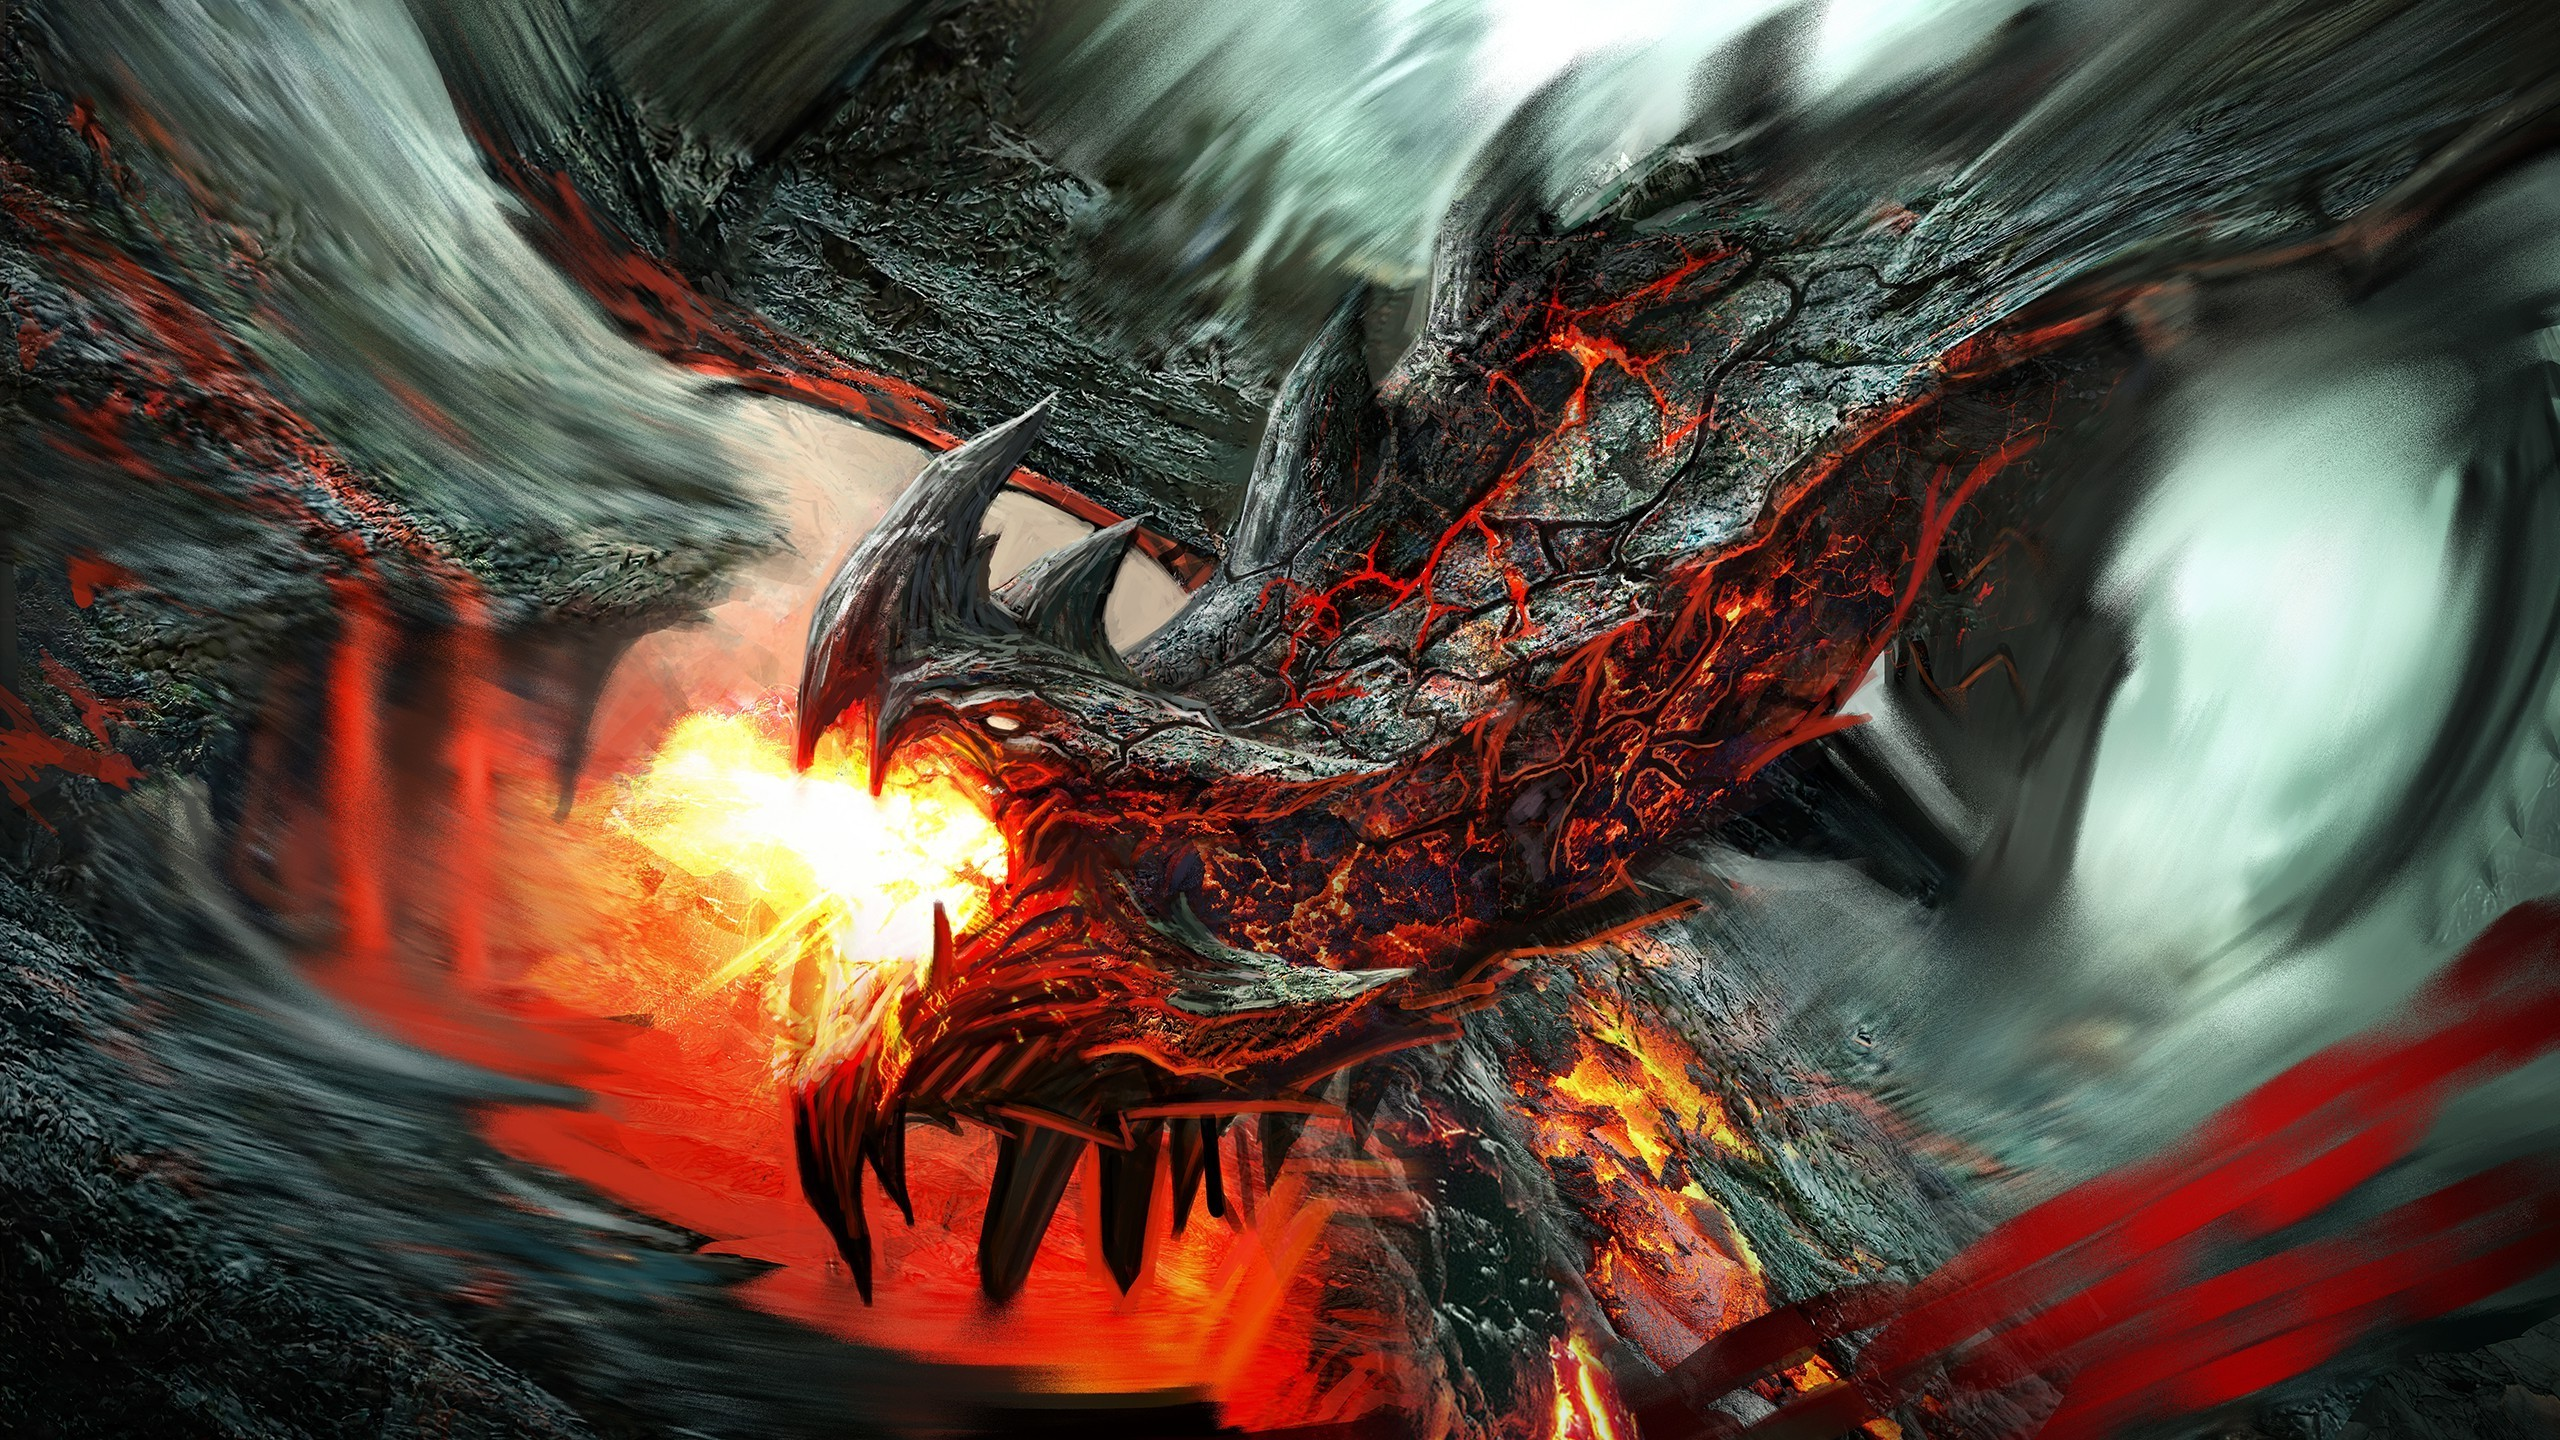 . PlusPng.com Fire breathing lava dragon HD Wallpaper 2560x1440 - Fire Breathing Dragon PNG HD